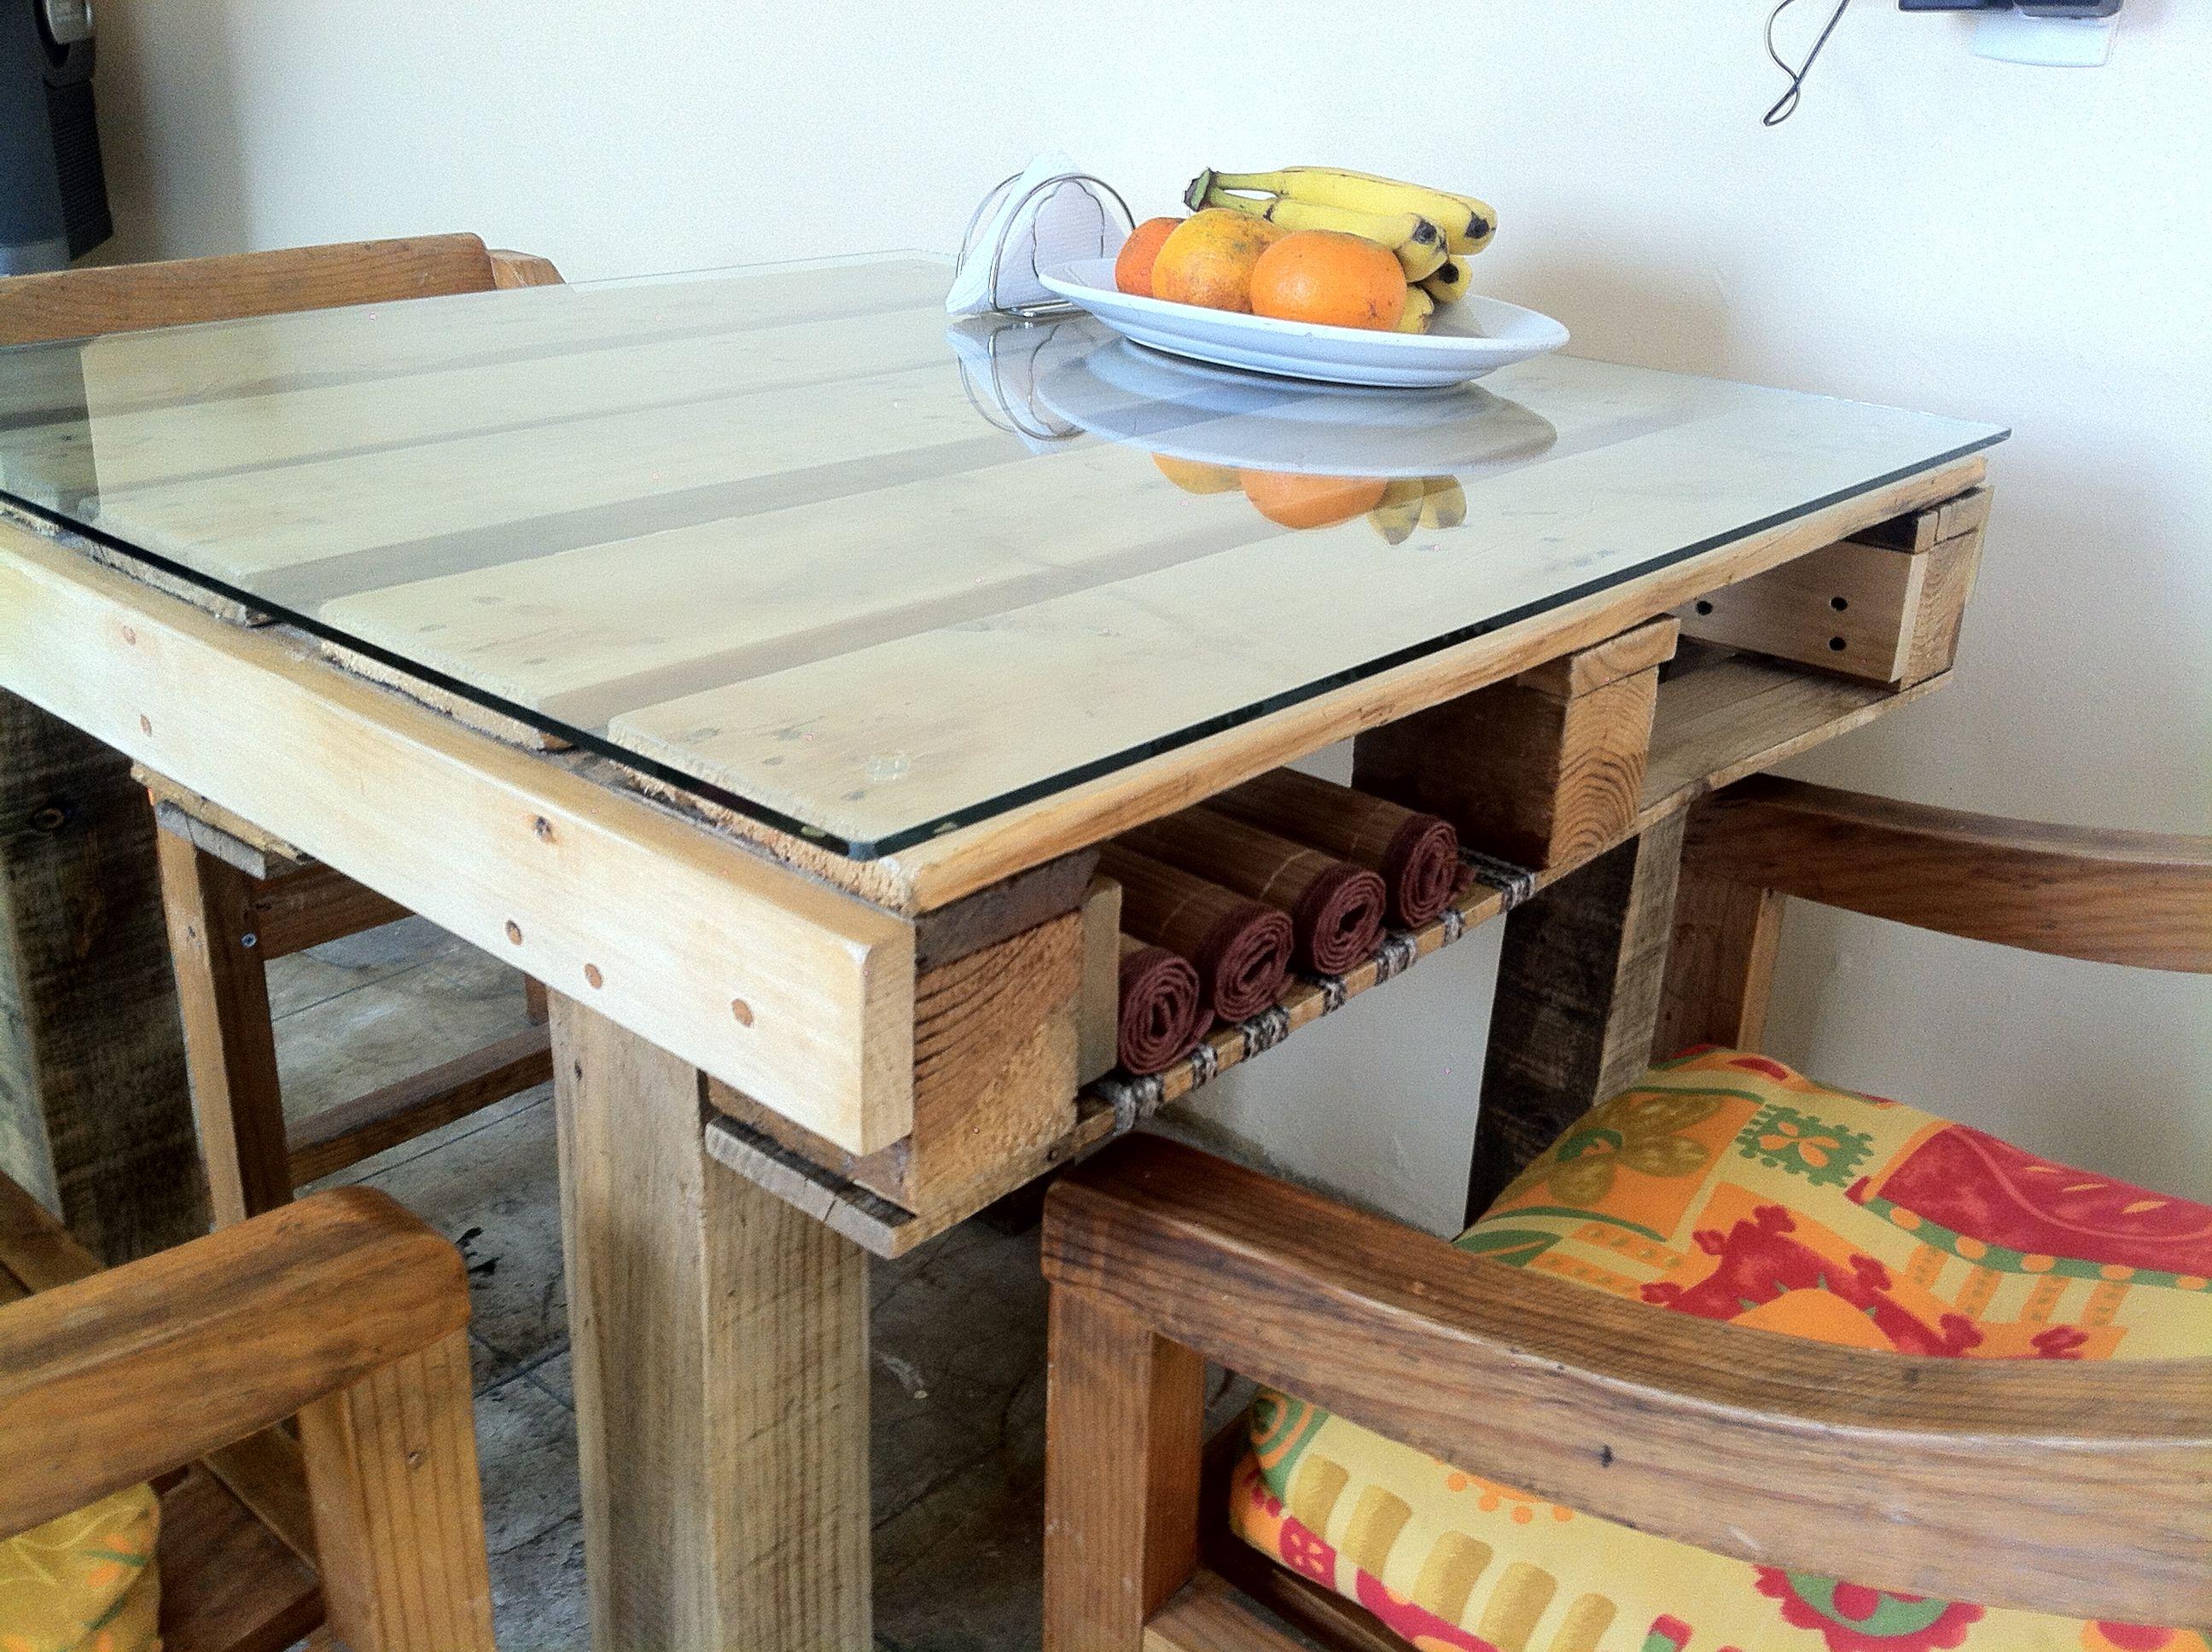 A Simple Pallet Table 1001 Pallets Cassetti Scale Arredamento Tavolini